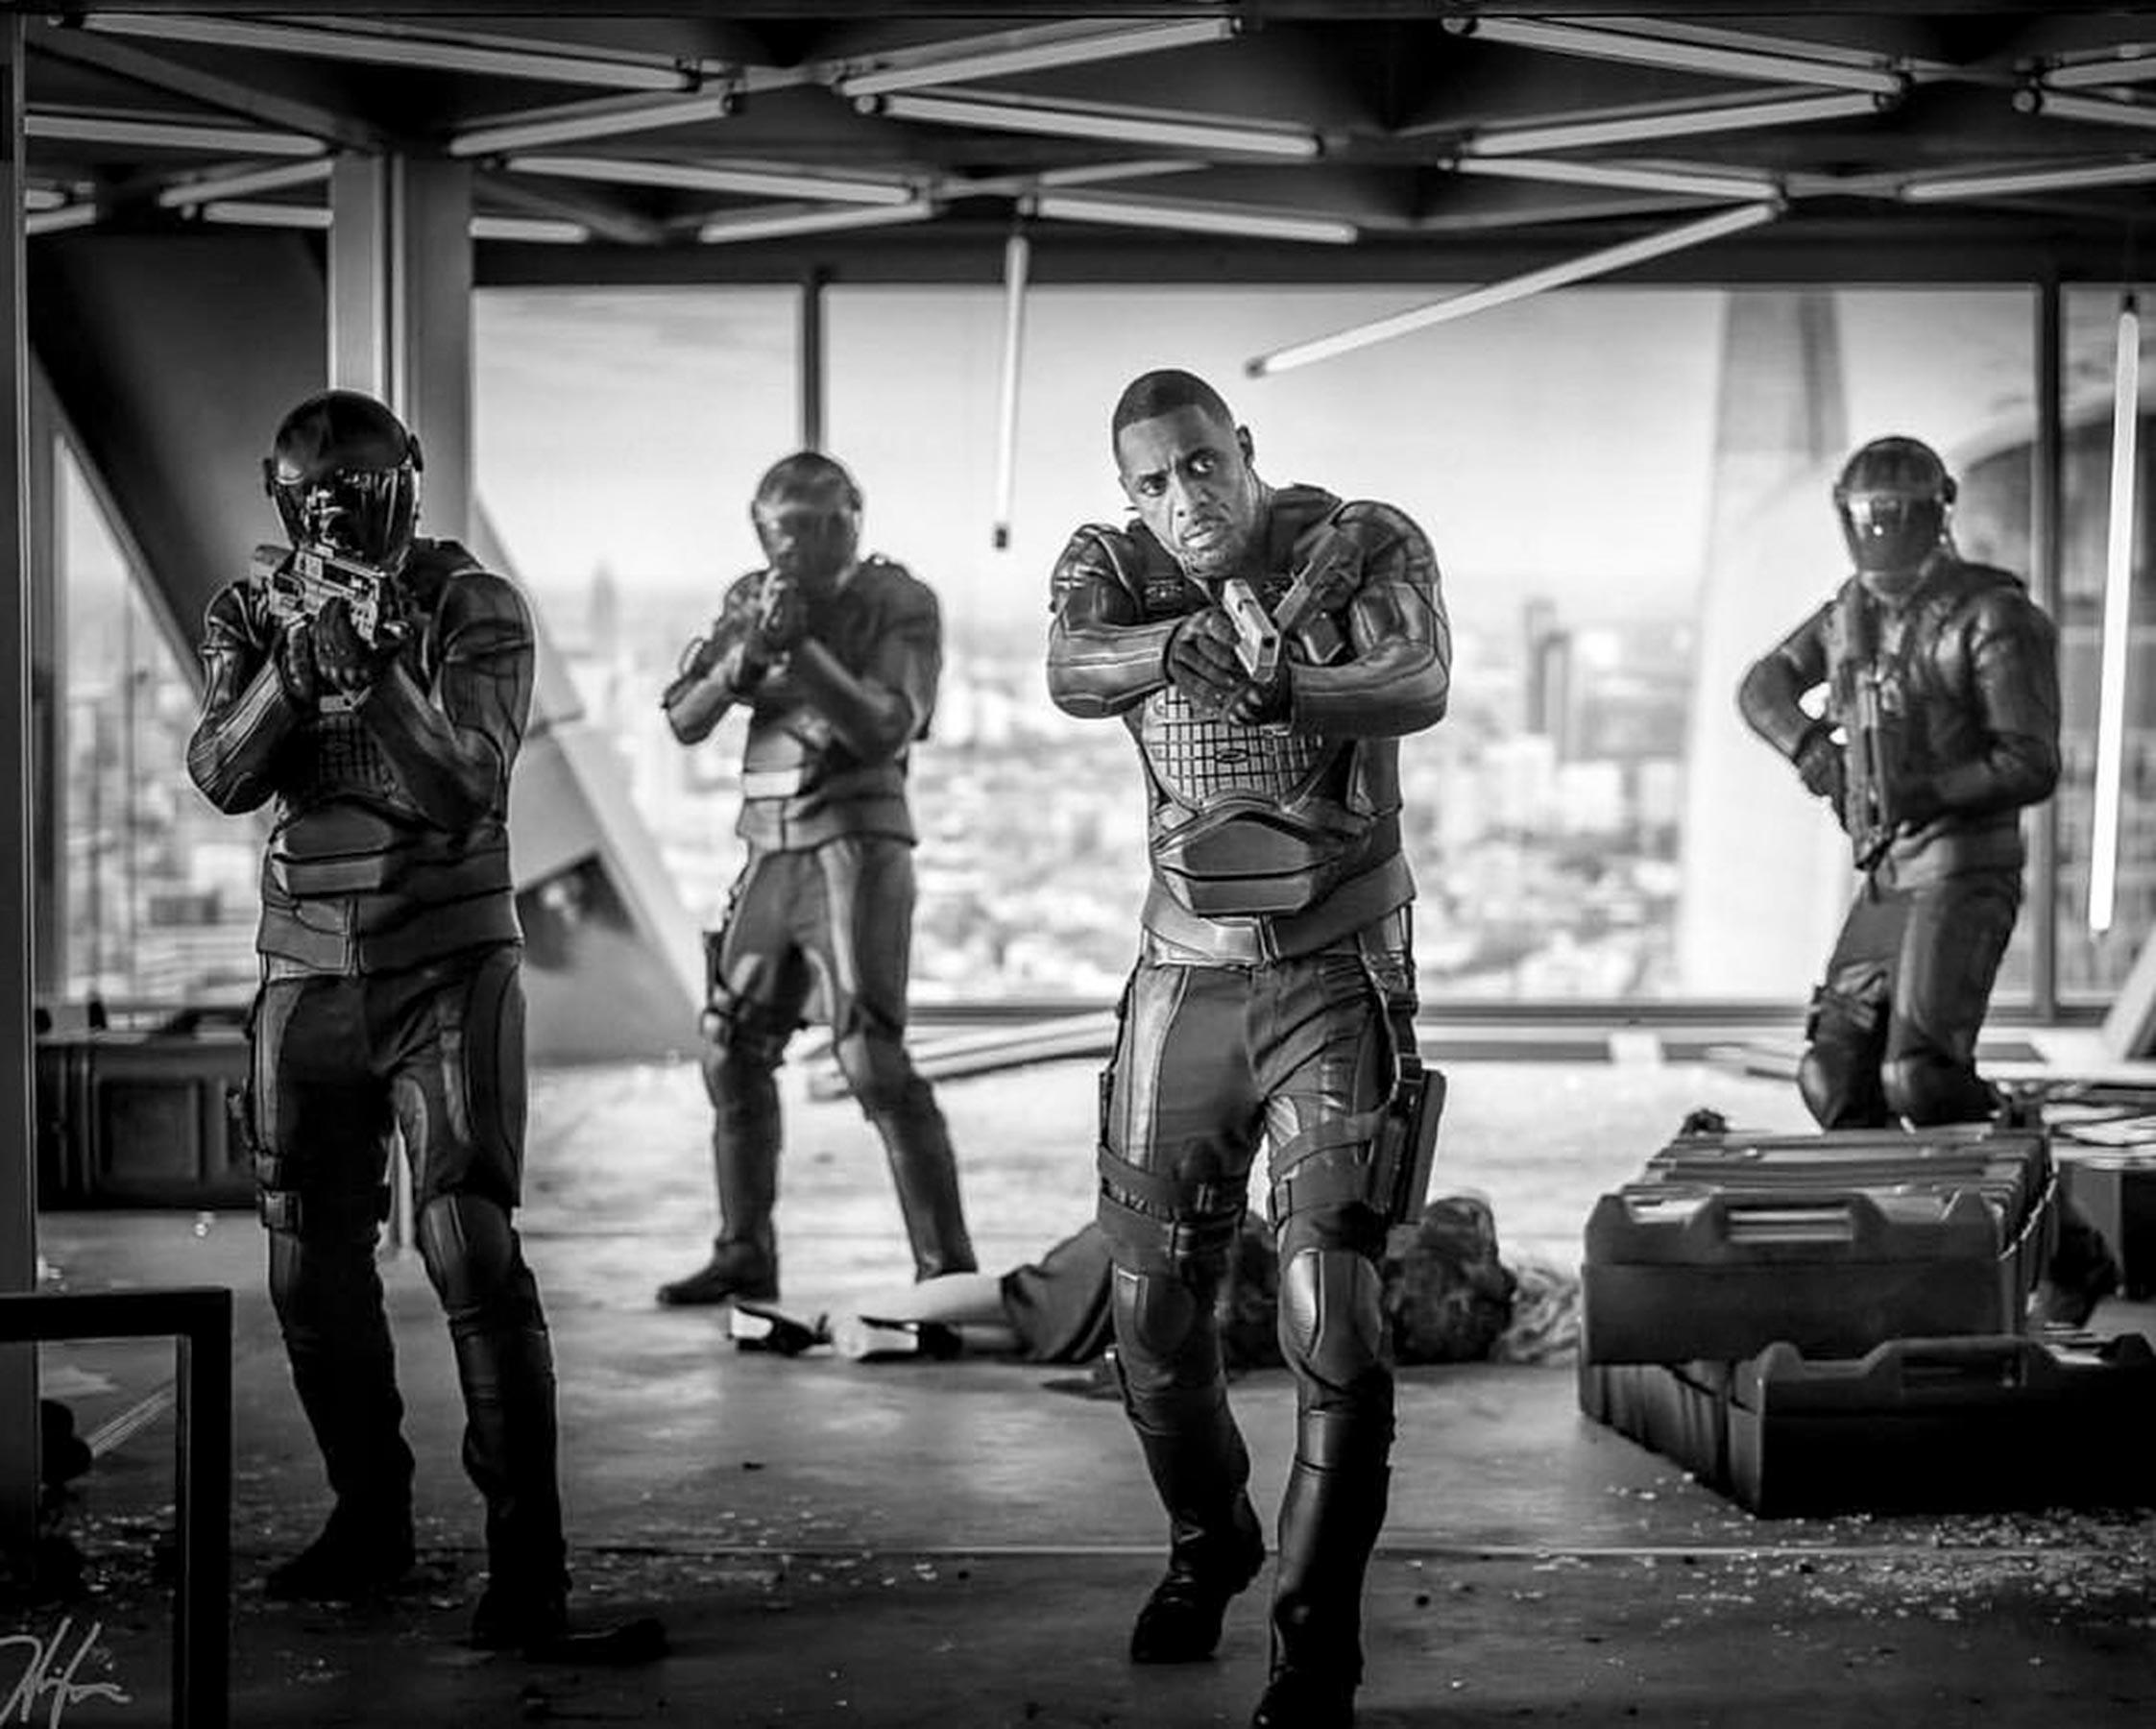 Jason Statham hypes up funnier-than-expected <em>Hobbs & Shaw</em>, Idris Elbas electric villain 3